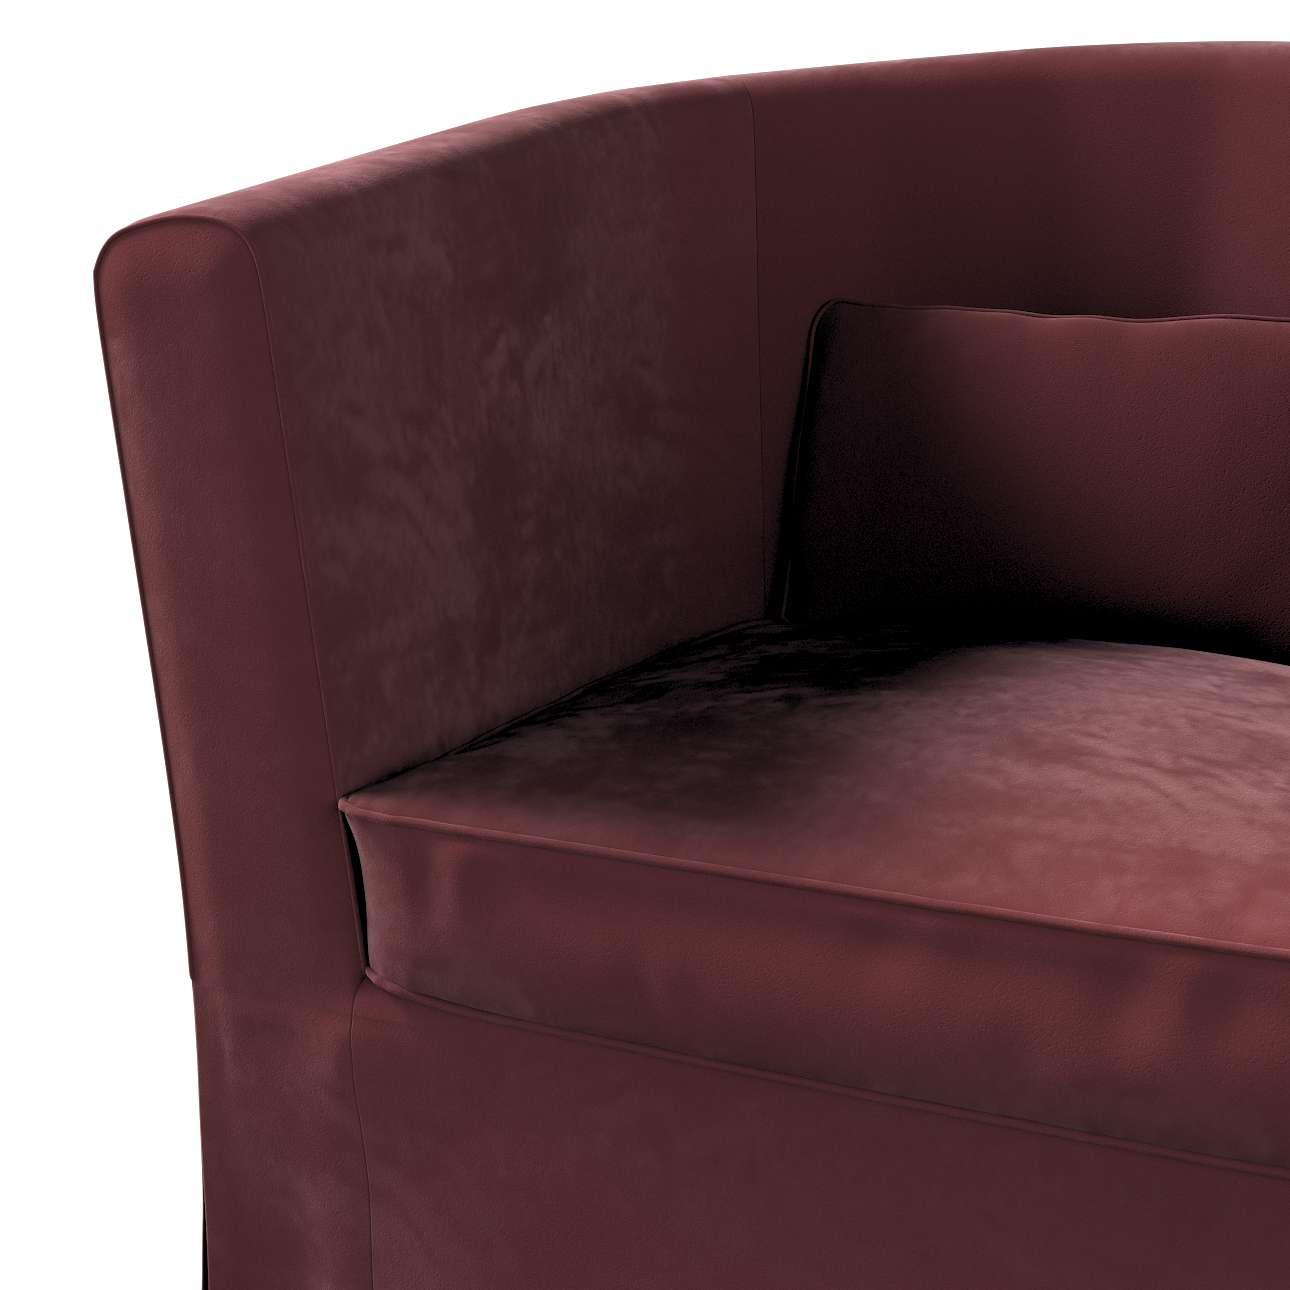 Pokrowiec na fotel Ektorp Tullsta w kolekcji Velvet, tkanina: 704-26